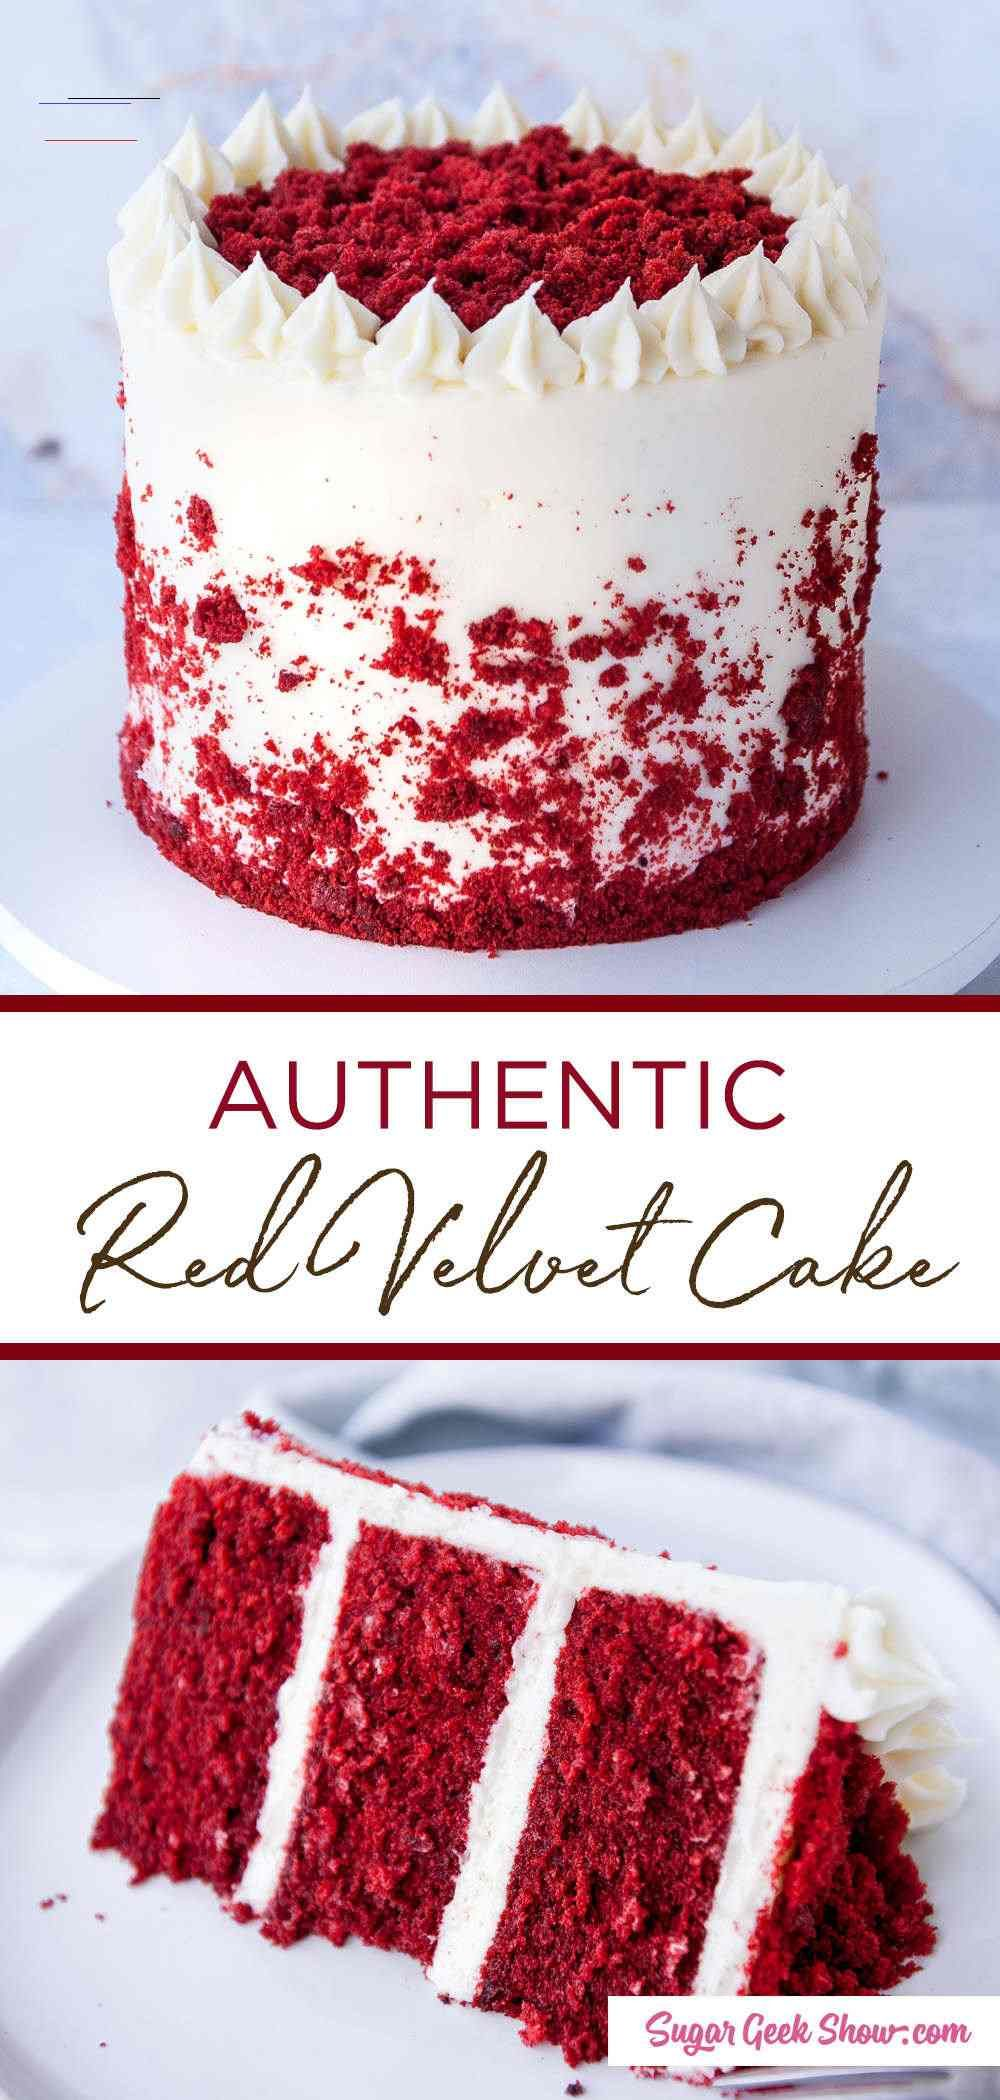 Halloweenbrownies In 2020 Velvet Cake Recipes Chocolate Cake Recipe Real Red Velvet Cake Recipe